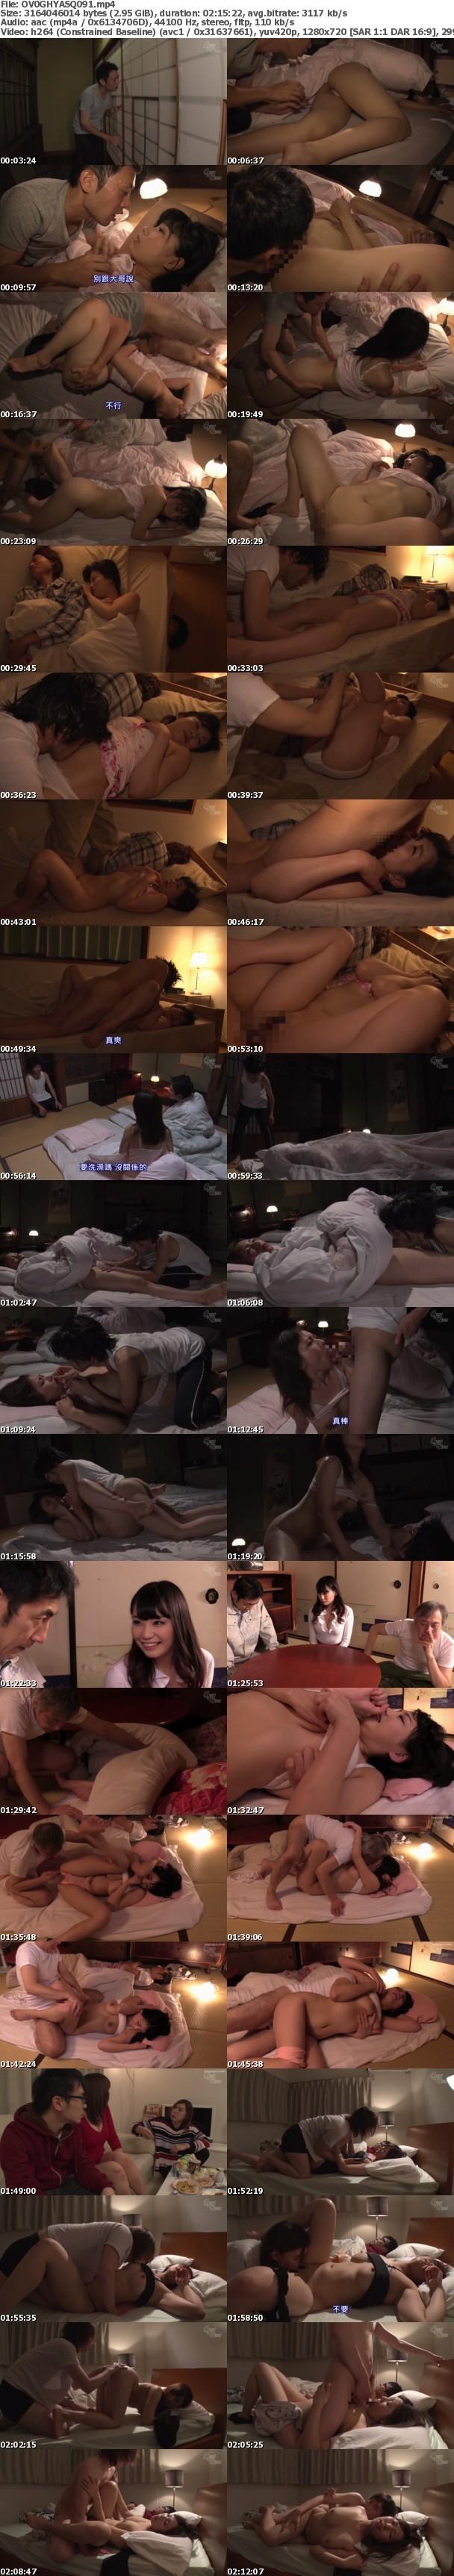 [HD] OVG-091 夜襲 半夜在睡著丈夫旁遭中出人妻 4[有碼高清中文字幕]